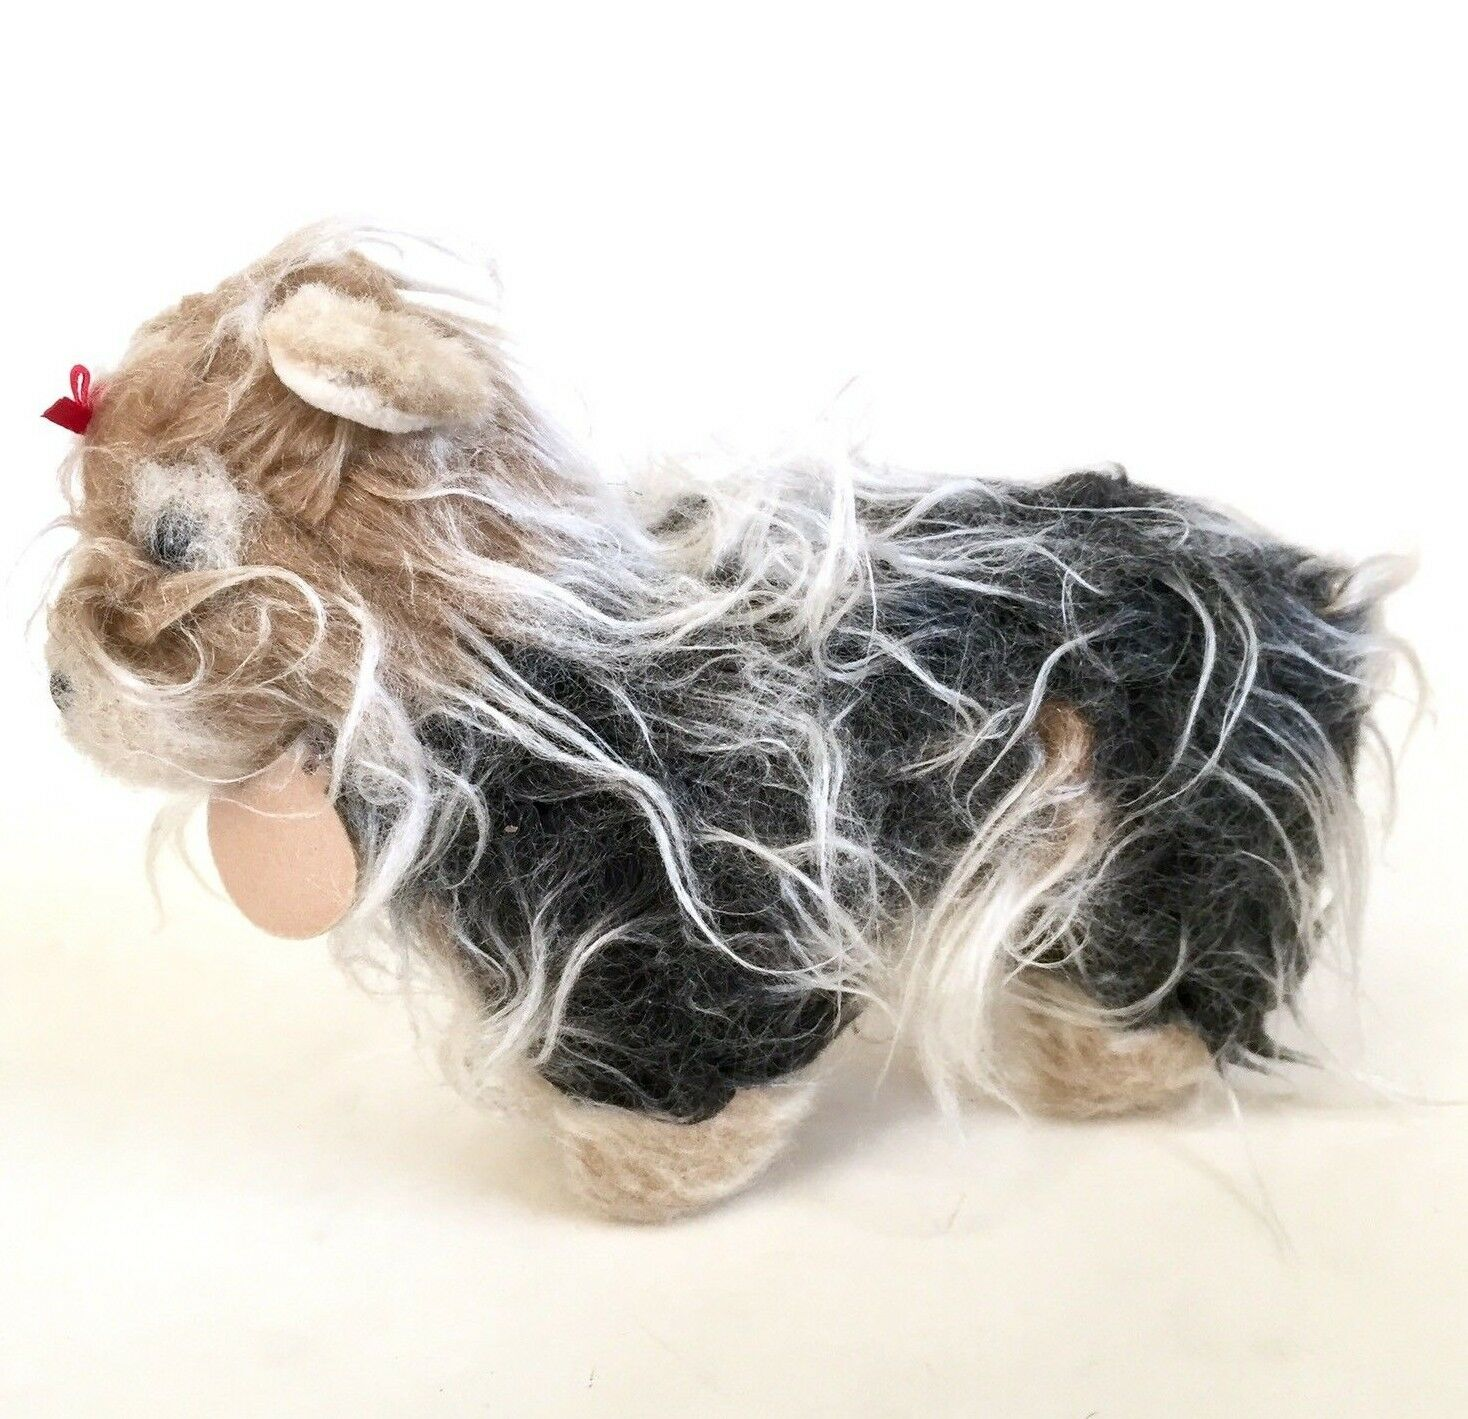 Vtg Prestige Aurora Handmade Shaggy Pet Dog Puppy Plush Stuffed Animal 11